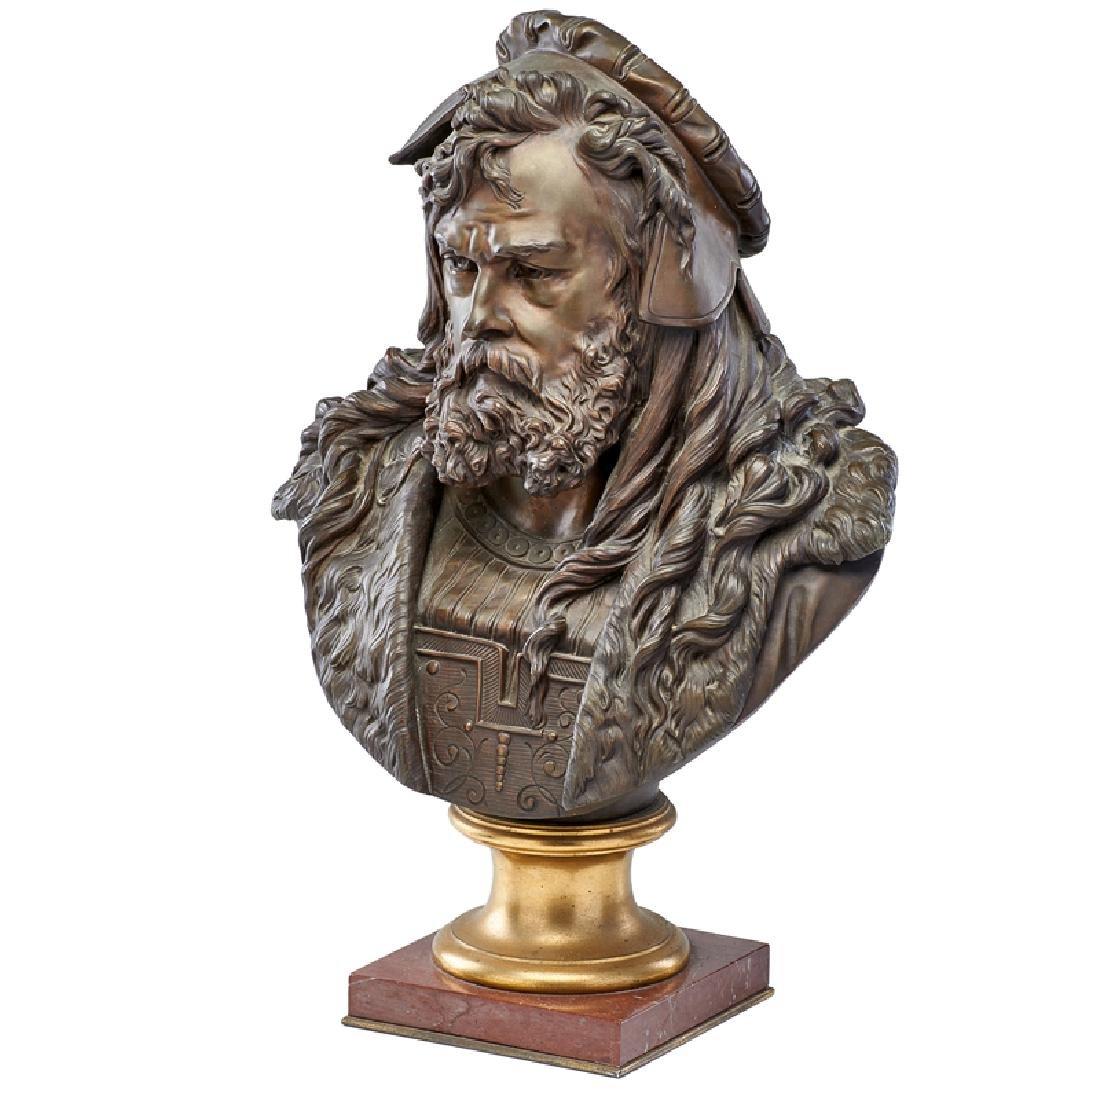 ALBERT-ERNEST CARRIER-BELLEUSE (French, 1824-1887)